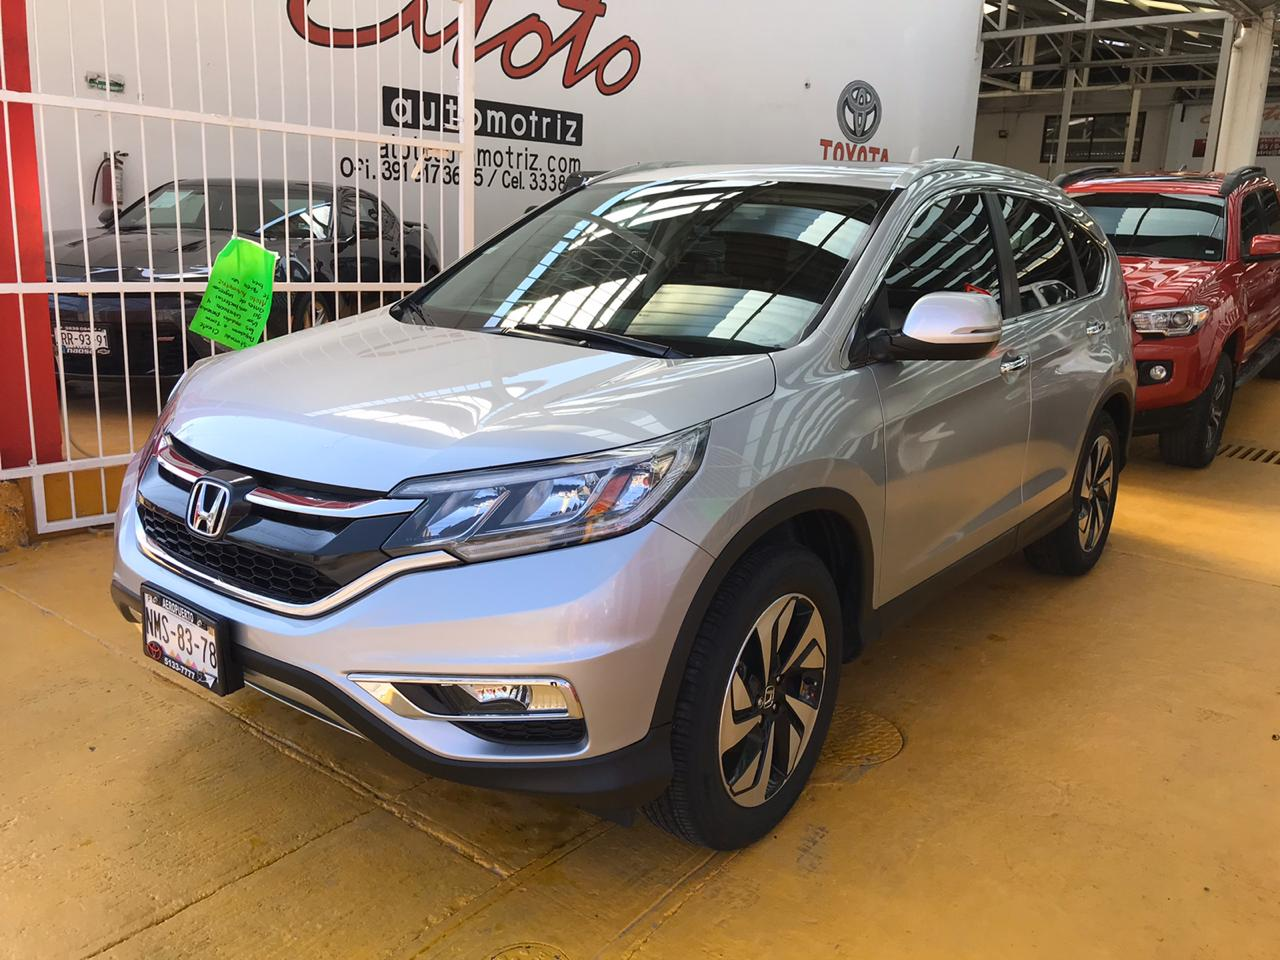 2015 Honda Cr-V EX-L Navi